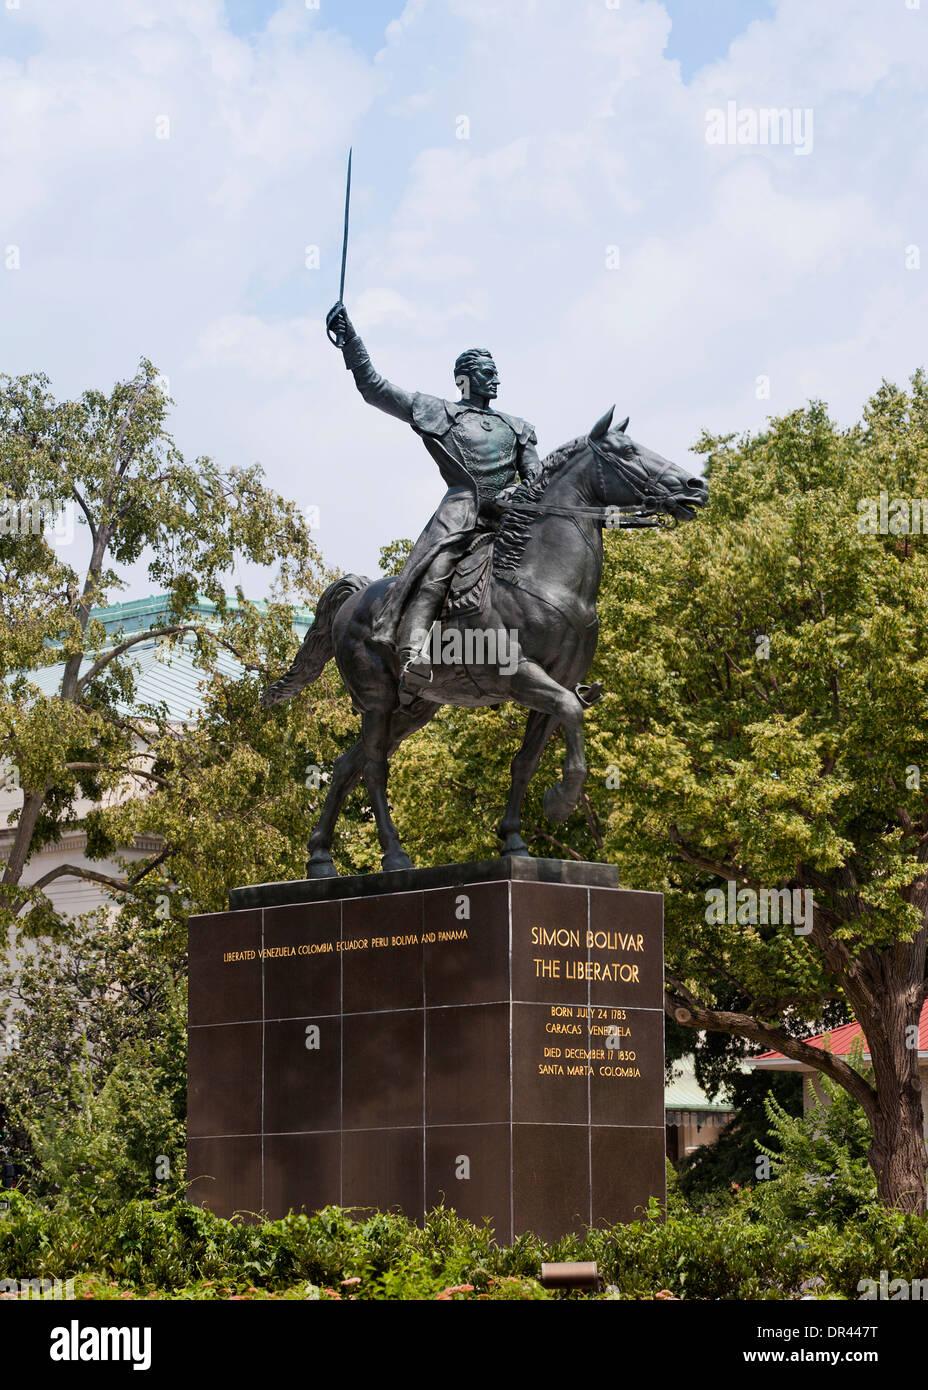 'Equestrian of Simon Bolivar' monument - Washington, DC USA - Stock Image